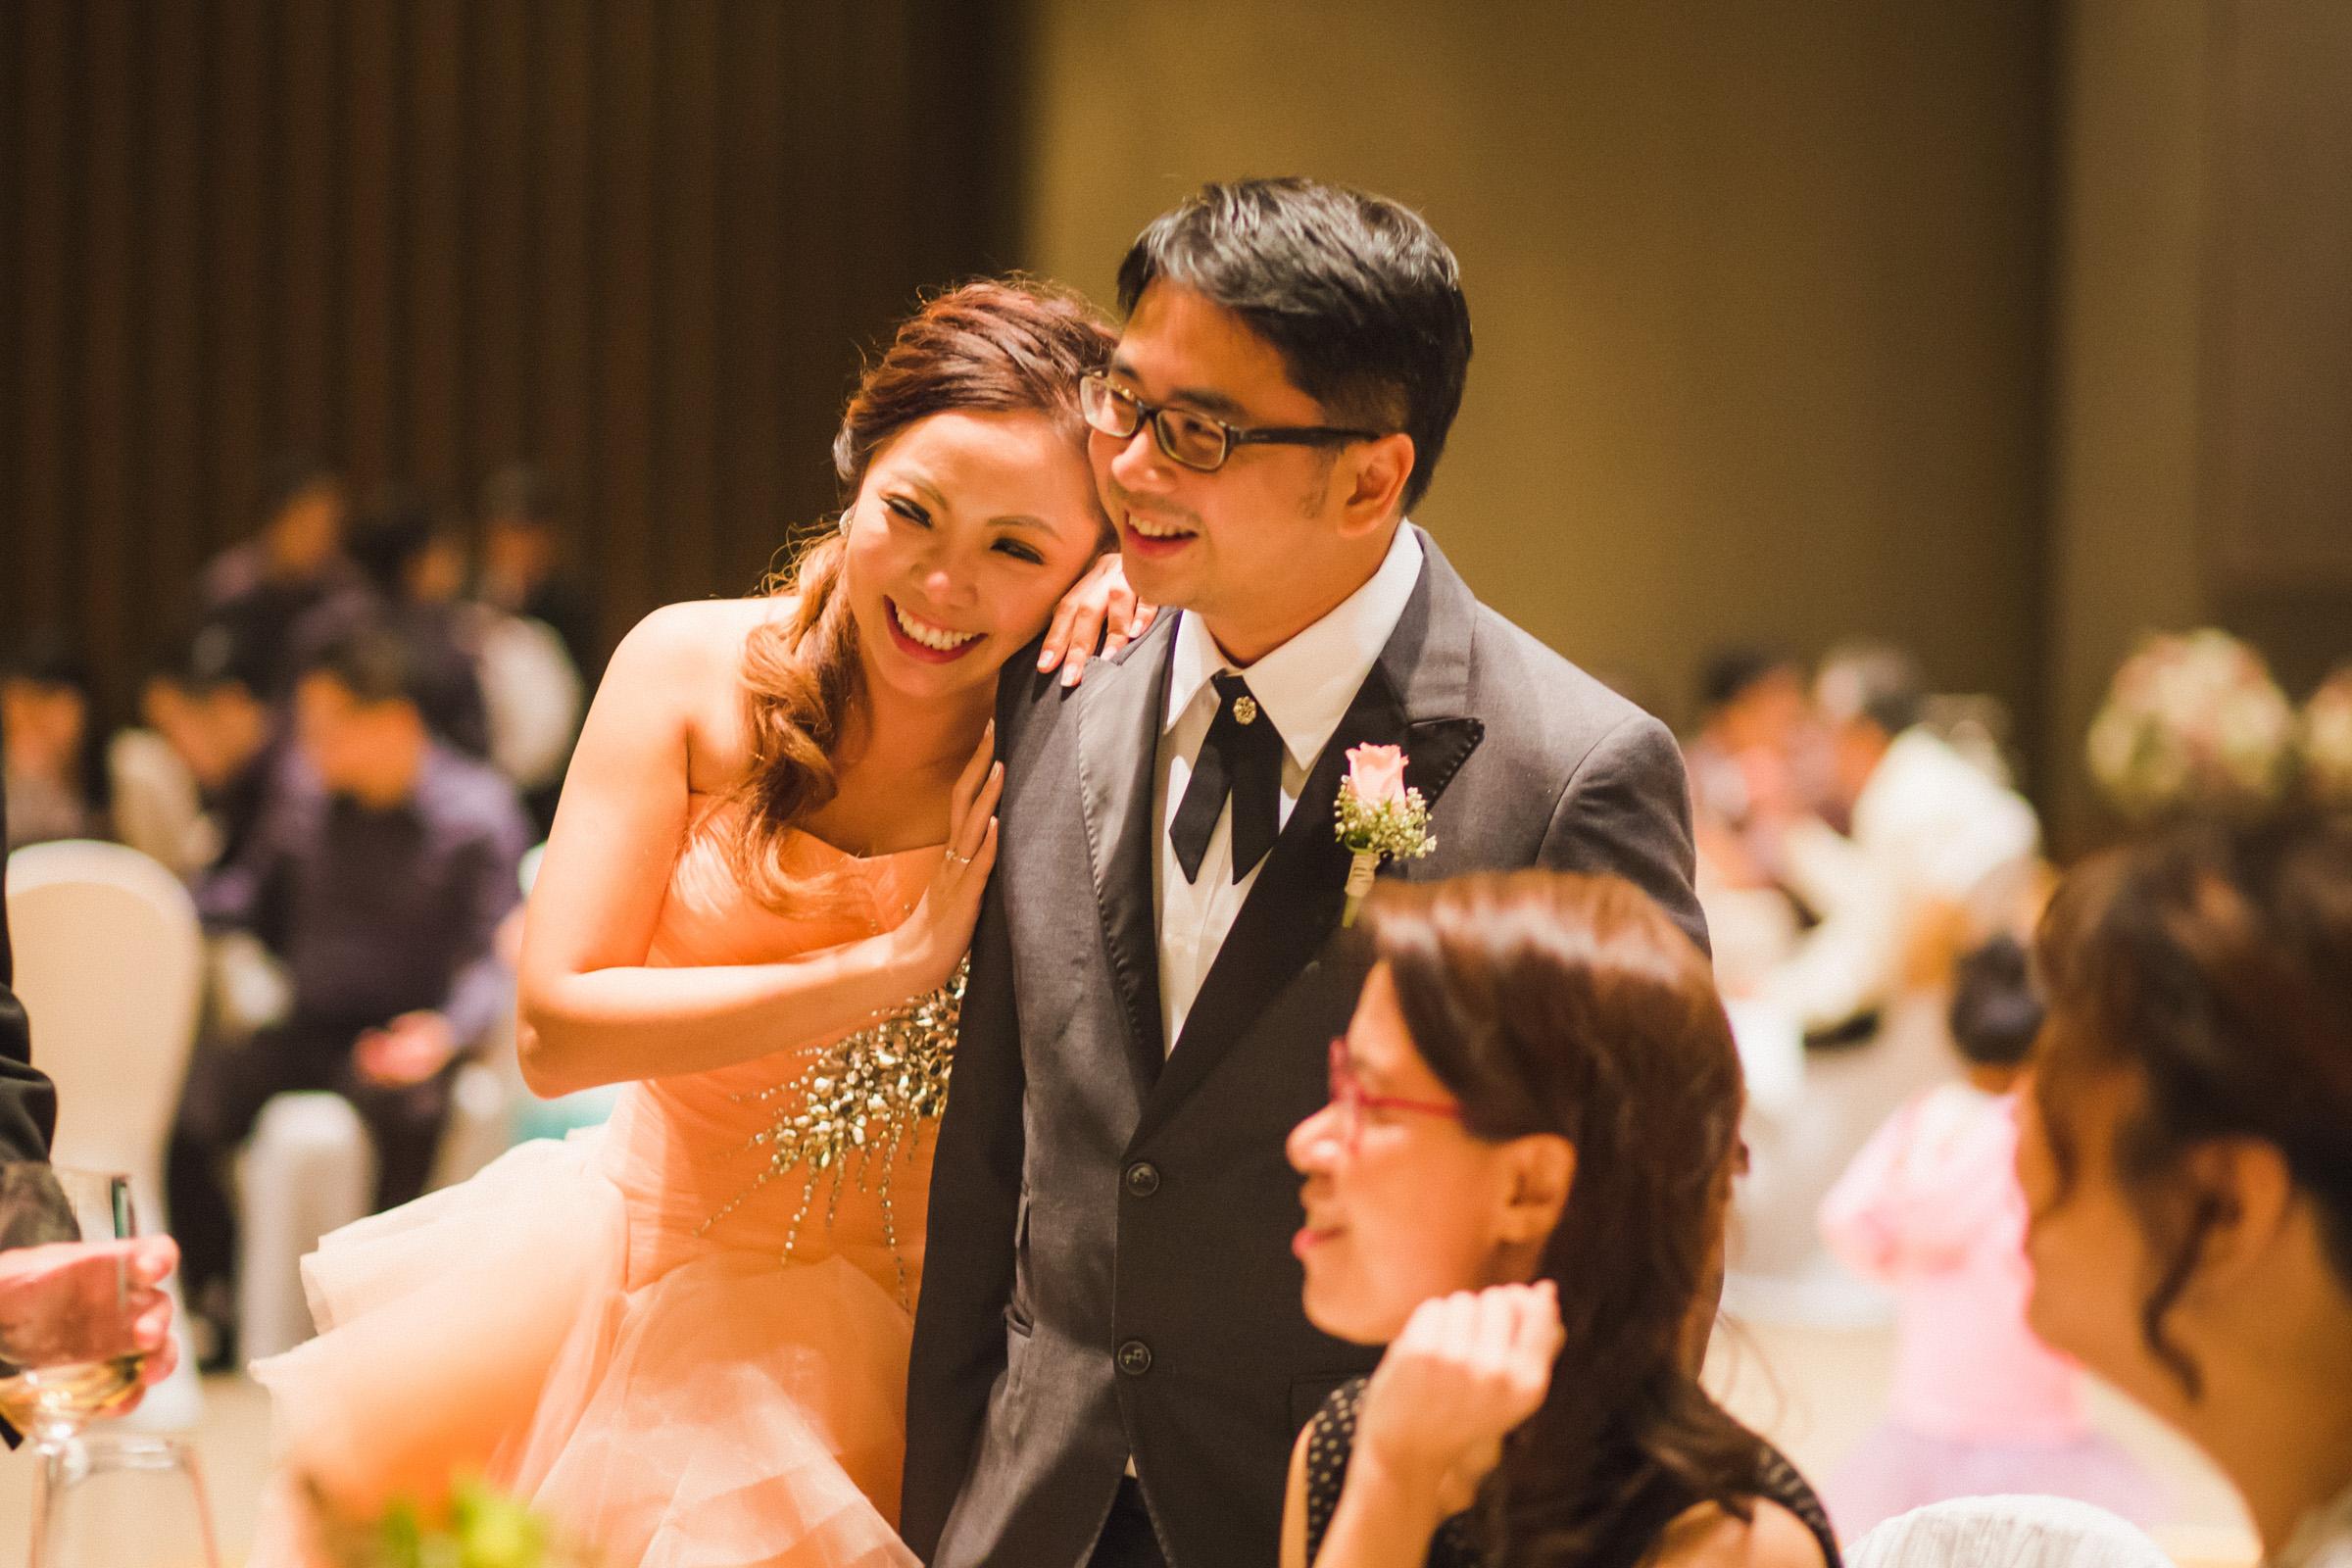 Steven_Jasmine_Wedding_Walldrobe Photography_Wedding shoots_Actual day wedding_Photographer (7)